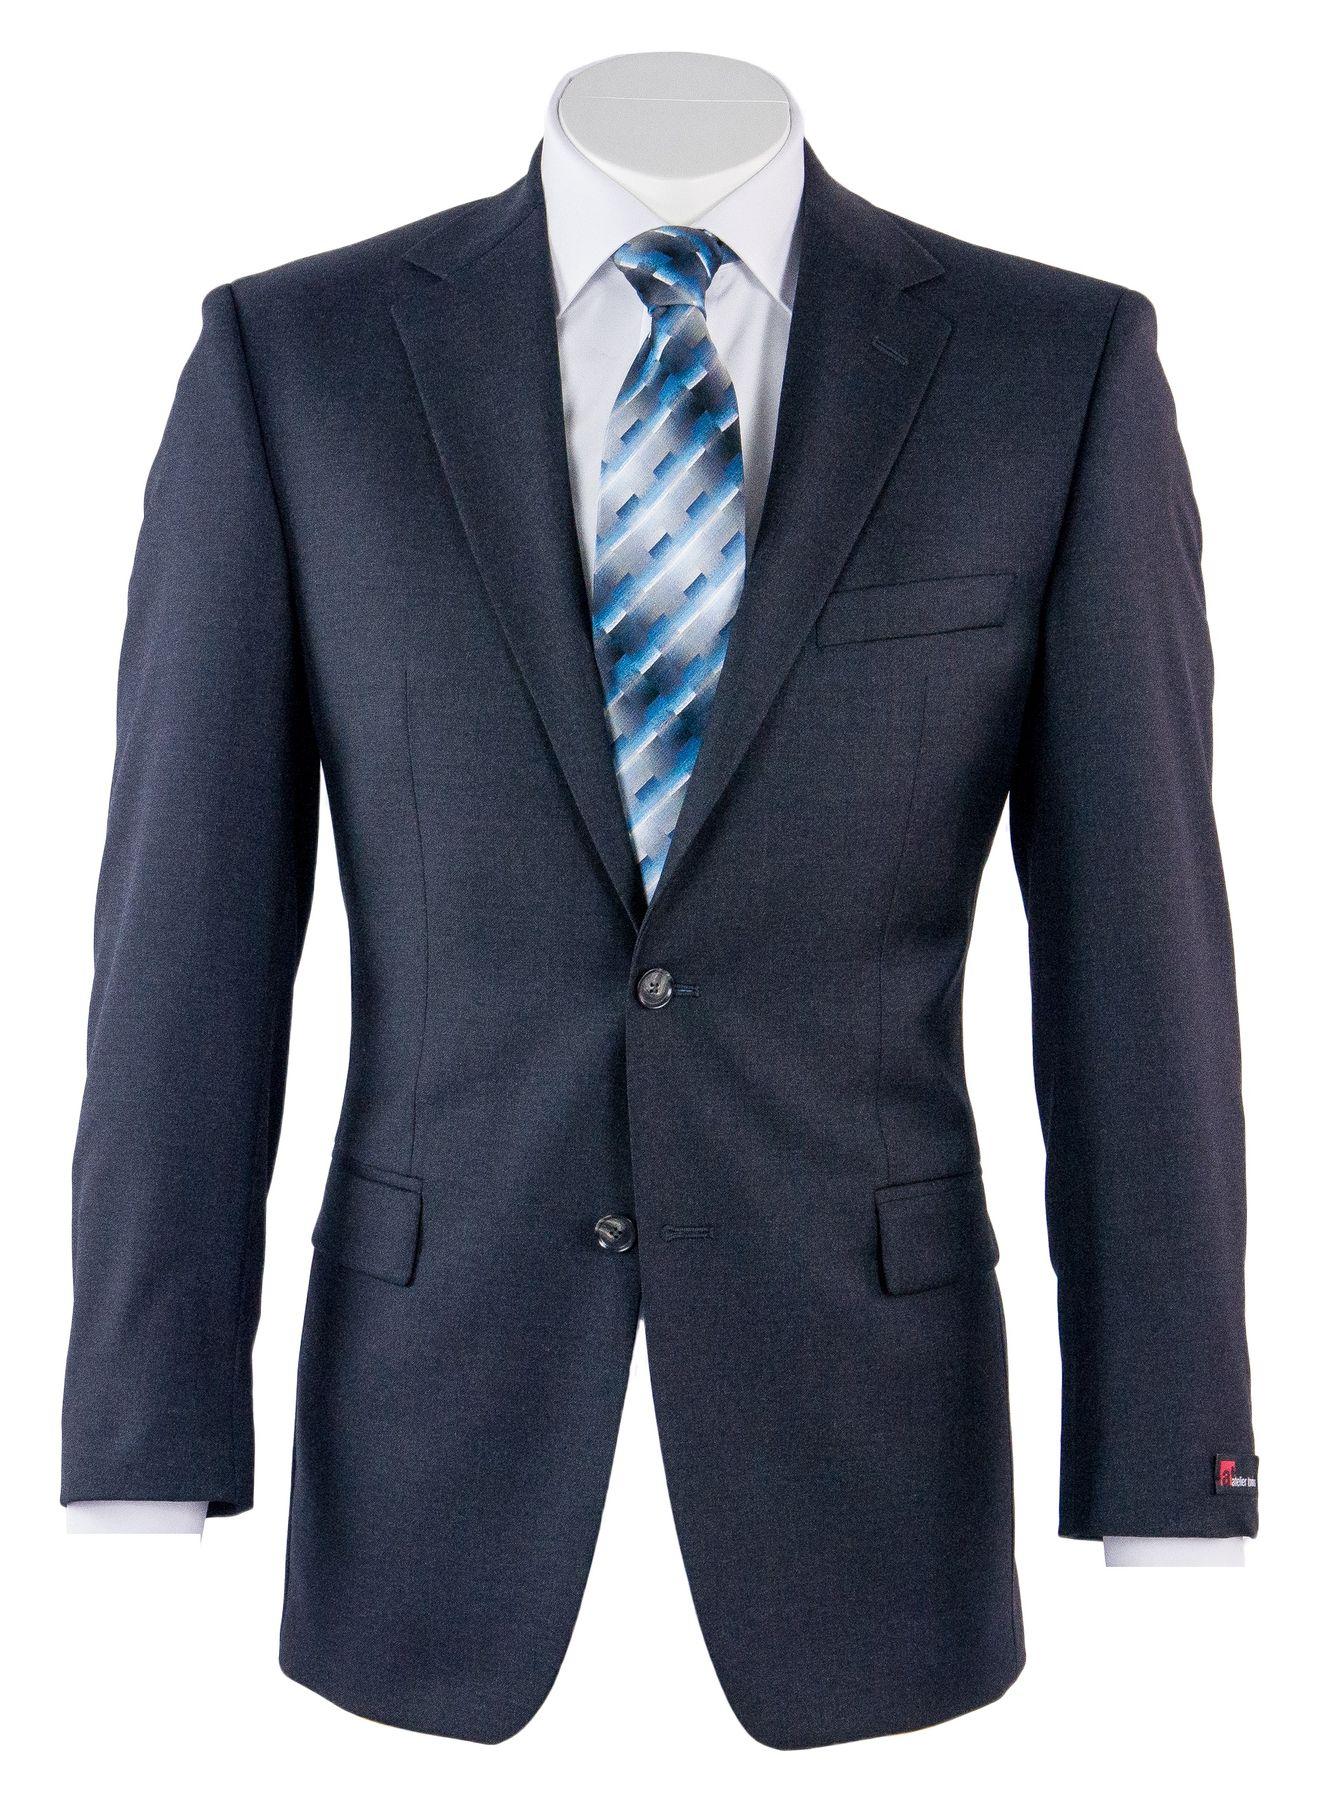 Atelier Torino - Classic Fit - Herren Baukasten Anzug des Webers Reda in verschiedenen Farben, Prestige SS/Rex (67136) – Bild 7